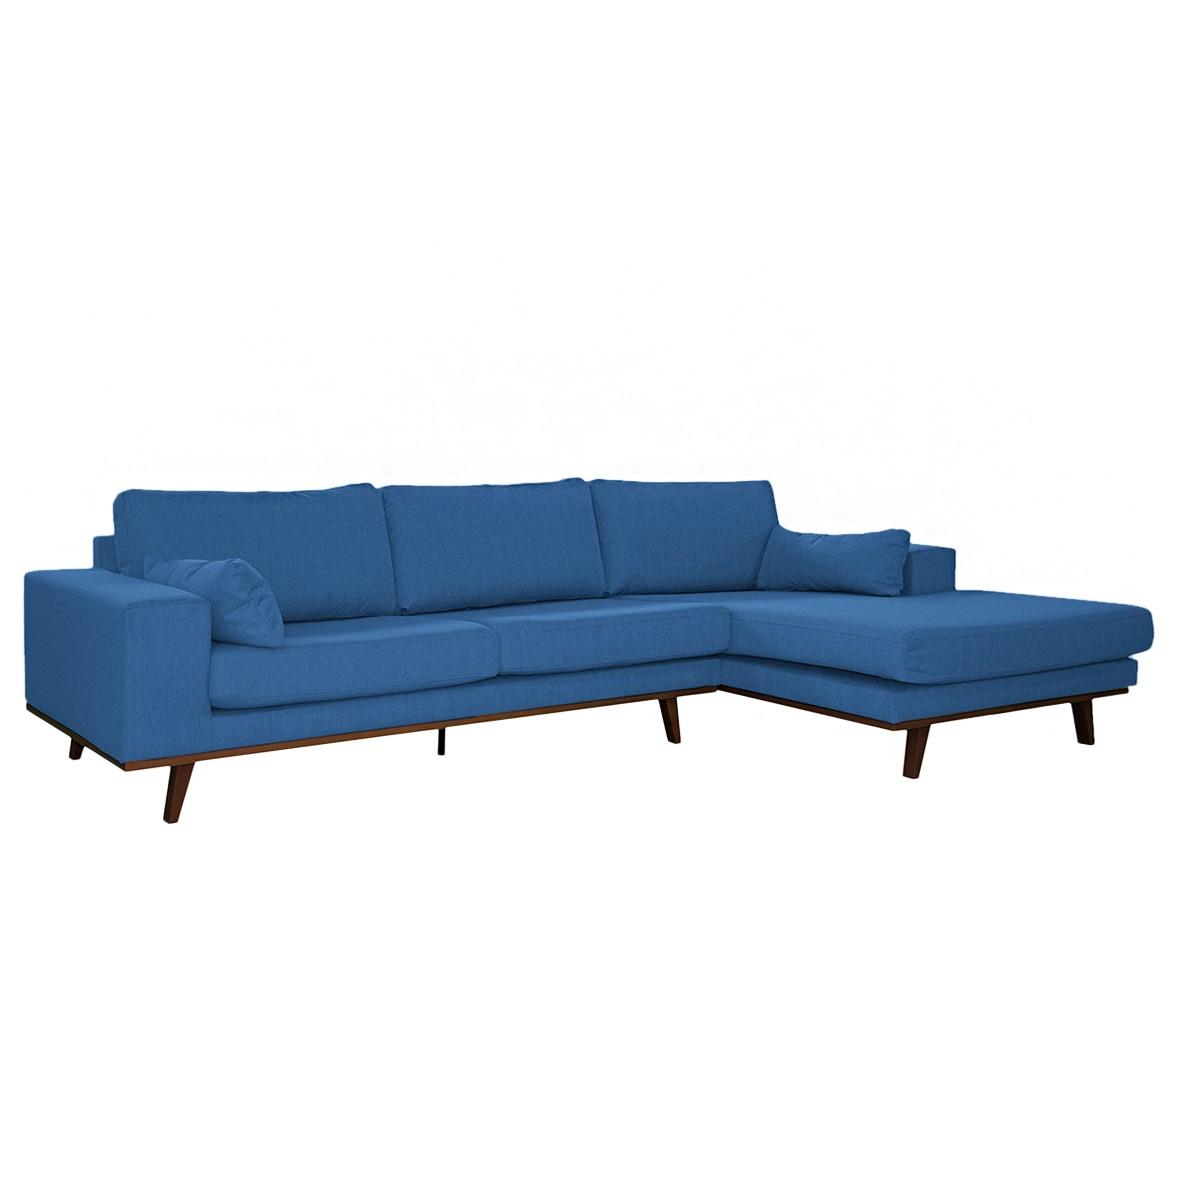 home24 Mørteens Ecksofa Billund II Brilliantblau Webstoff 282x81x151 cm (BxHxT)